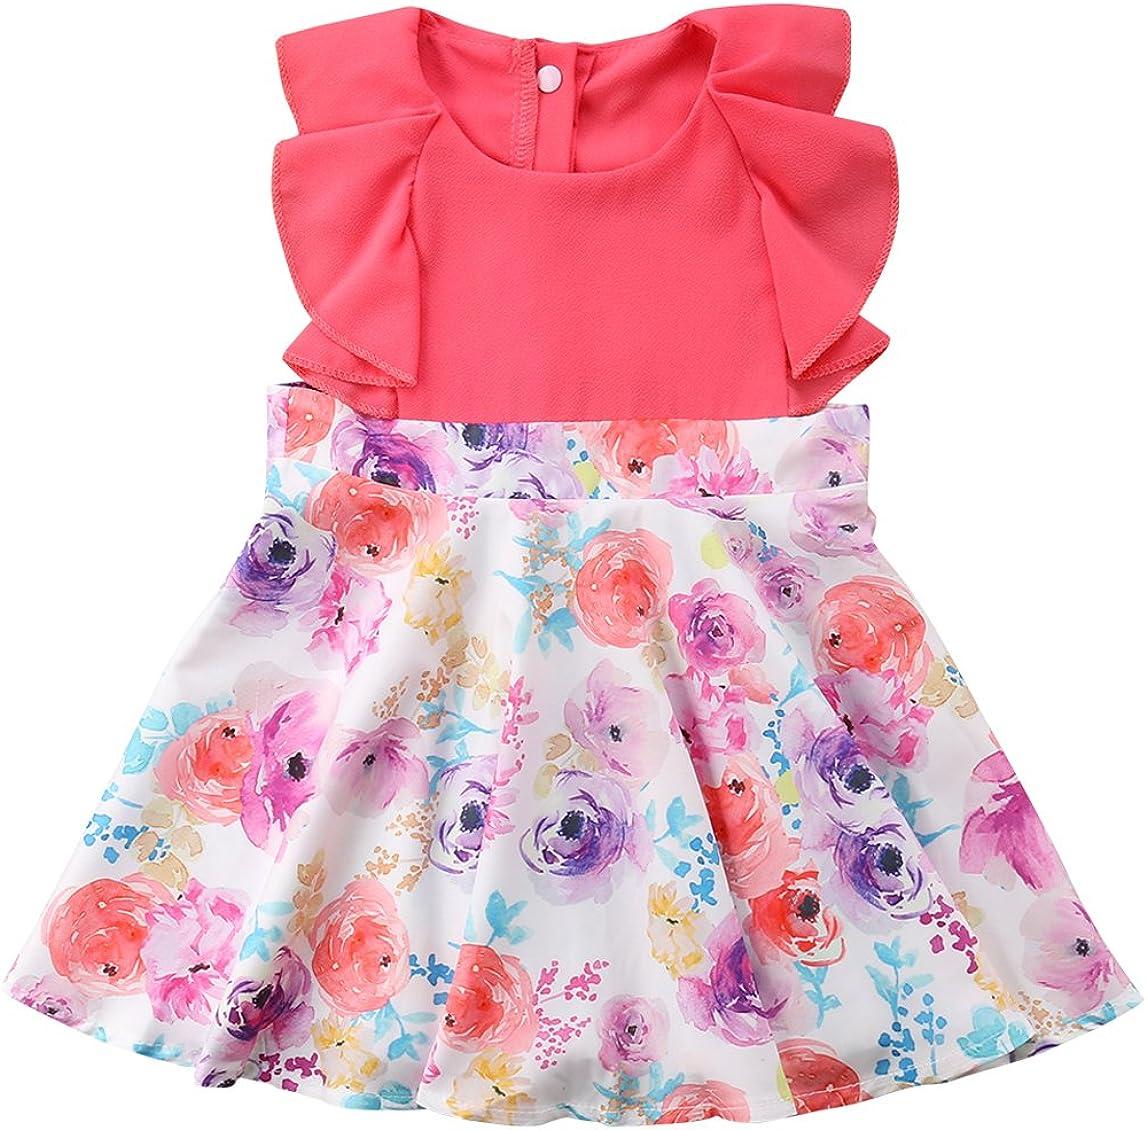 rechange Newborn Infant Baby Girl Bowknot Sleeveless Backless Ruffle Dress Summer Sundress